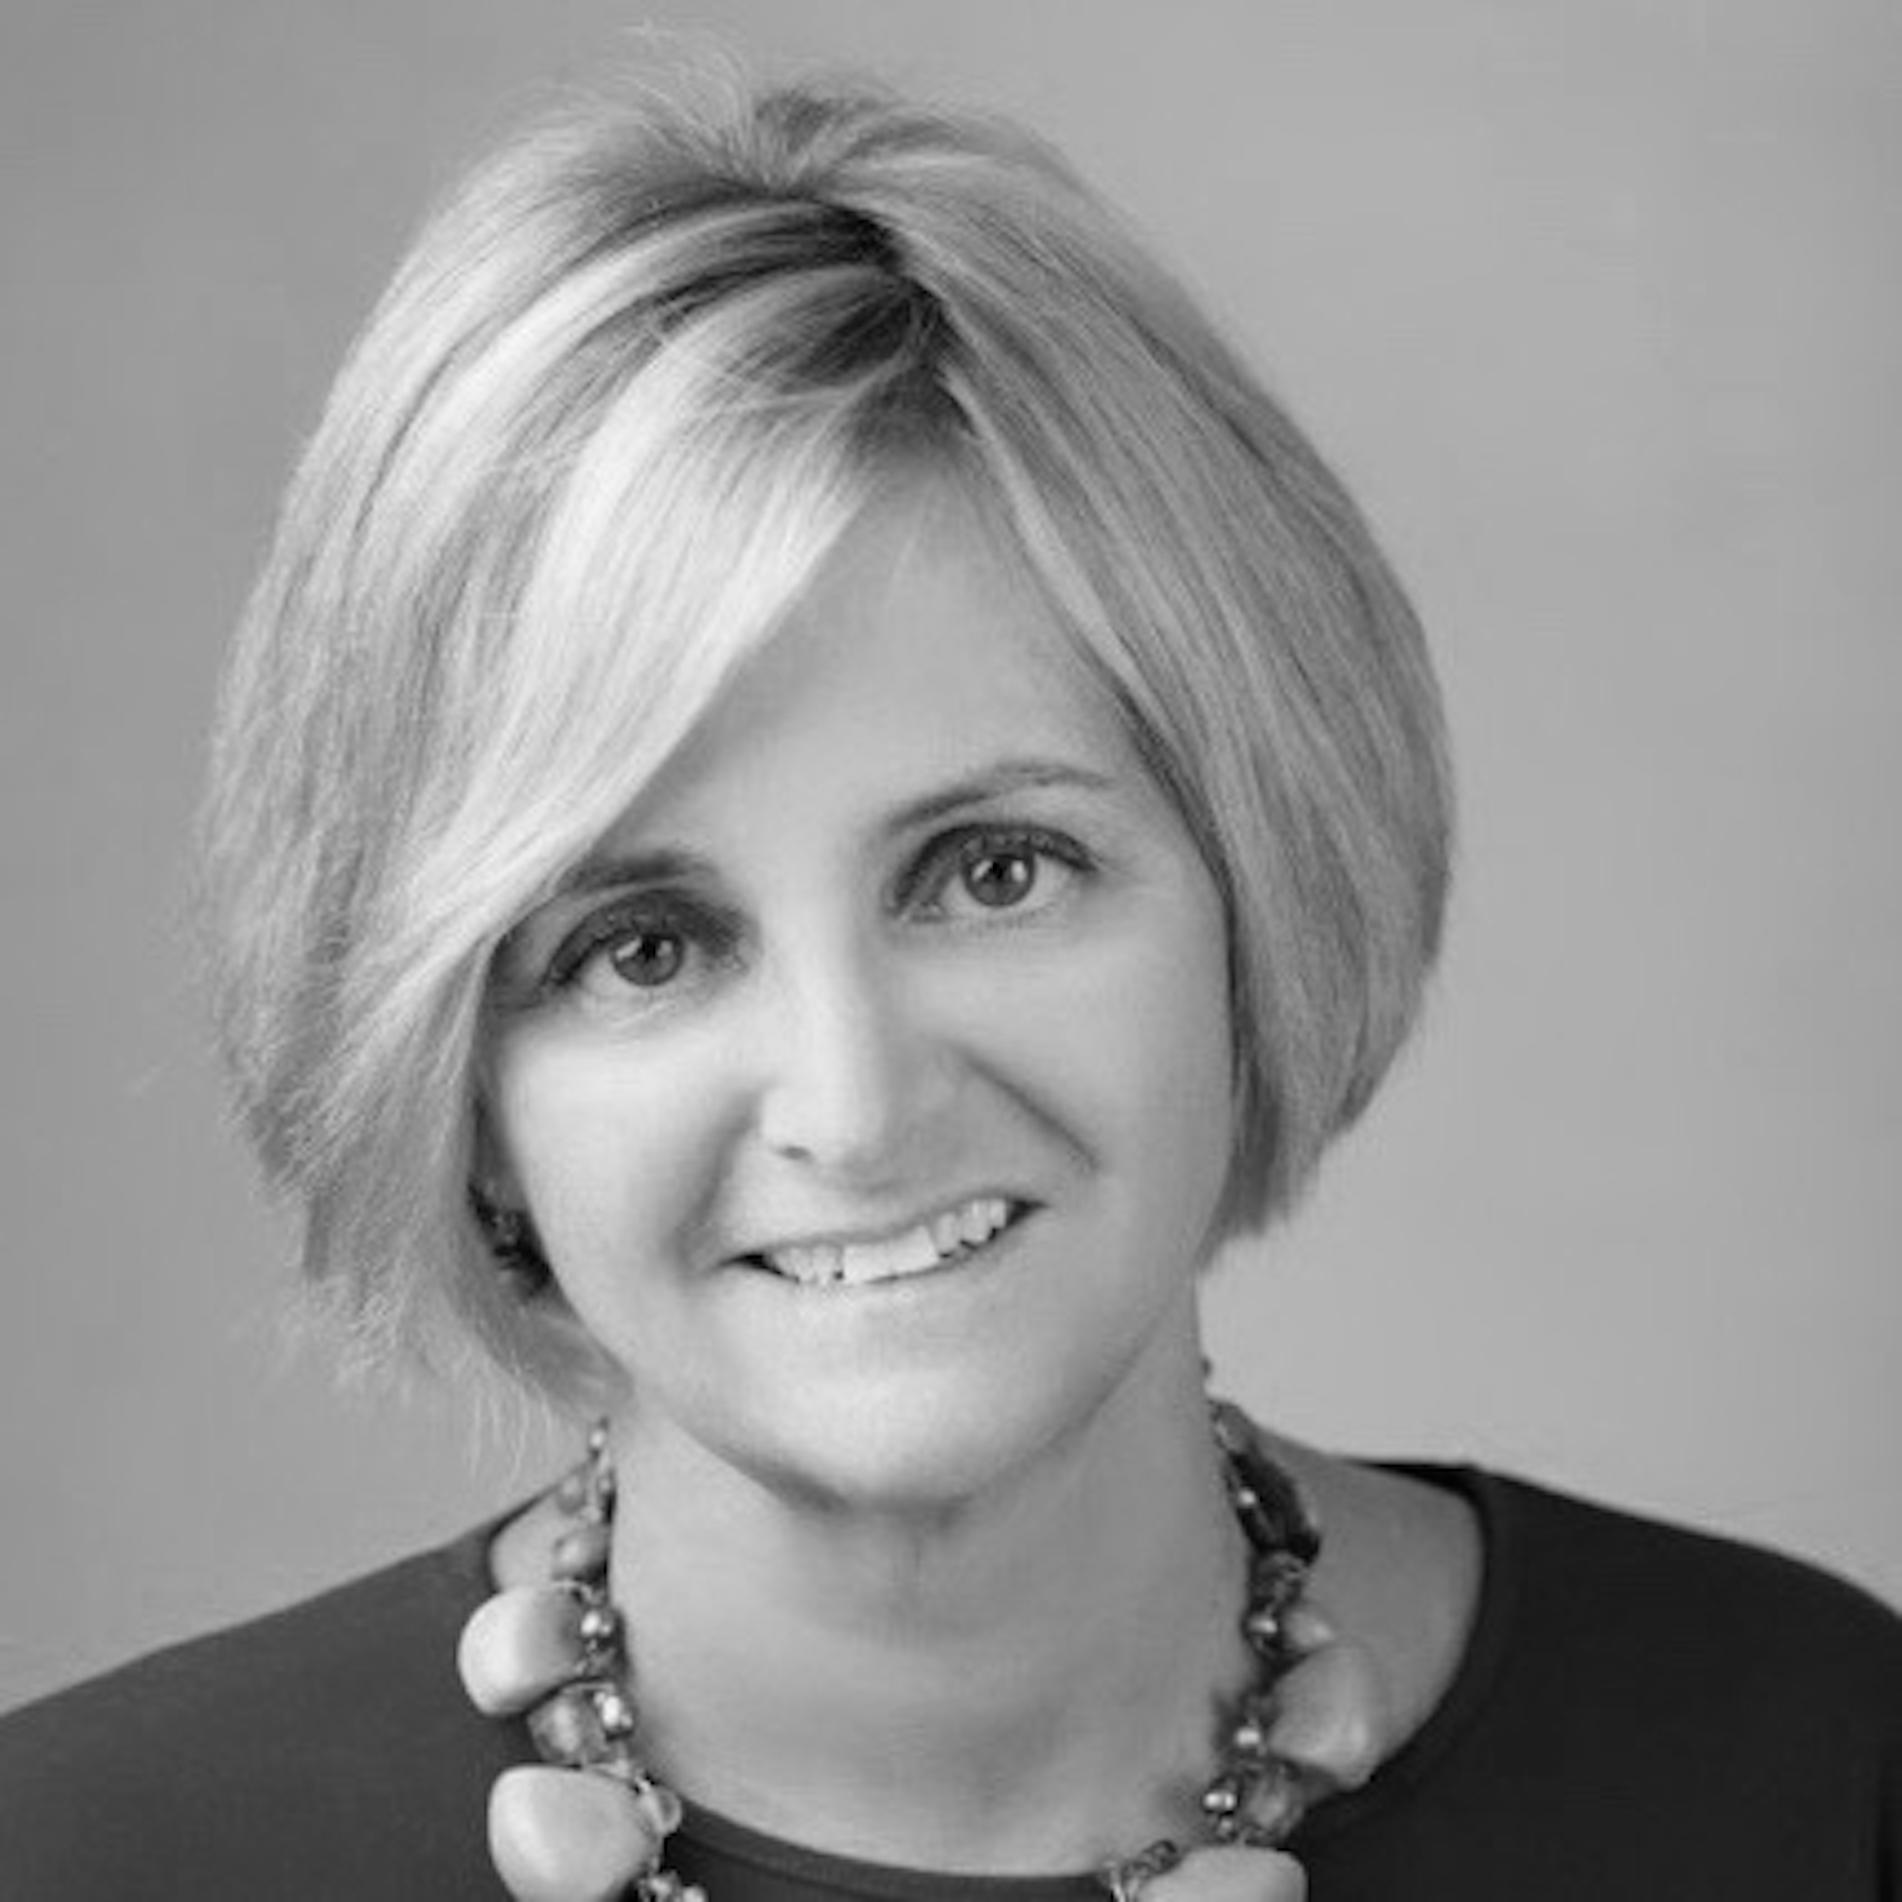 Loranne Ausley